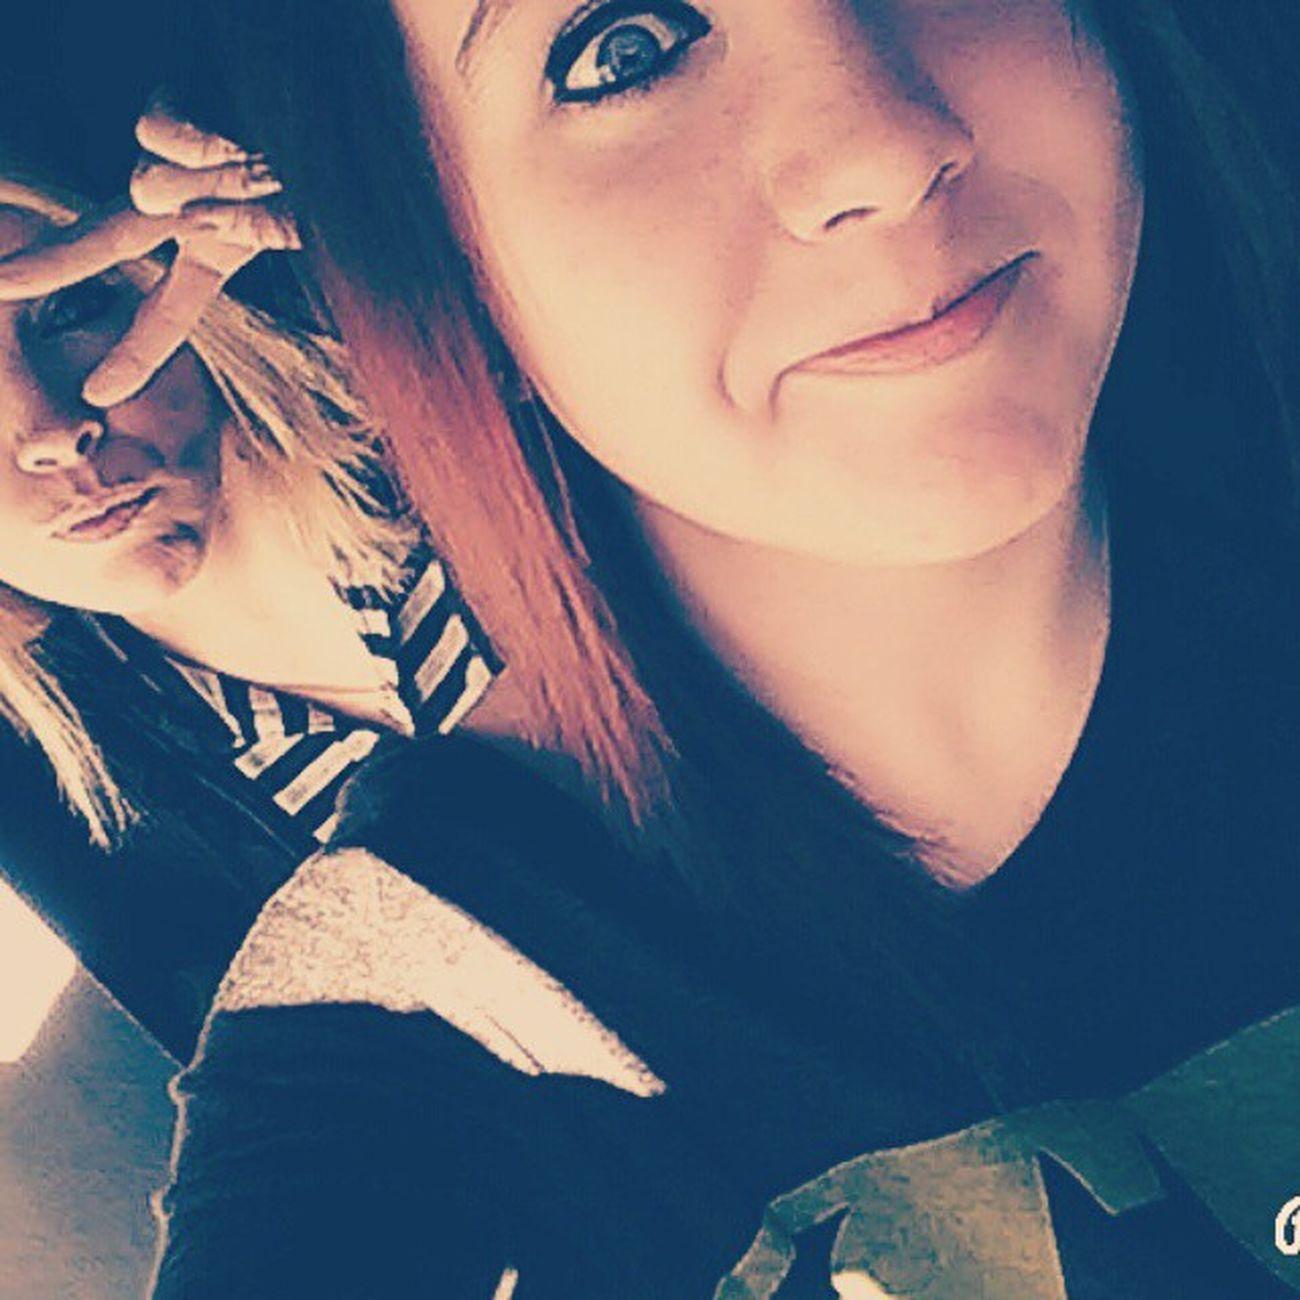 Selfie game like Selfieswiththebabygirl Iloveyou @rigbyy__ Roadtrip Tograndmas motherdaughtercrewsquadgoalswishesluckGodiswithusscenechickpunkgirlsskyisthelimit